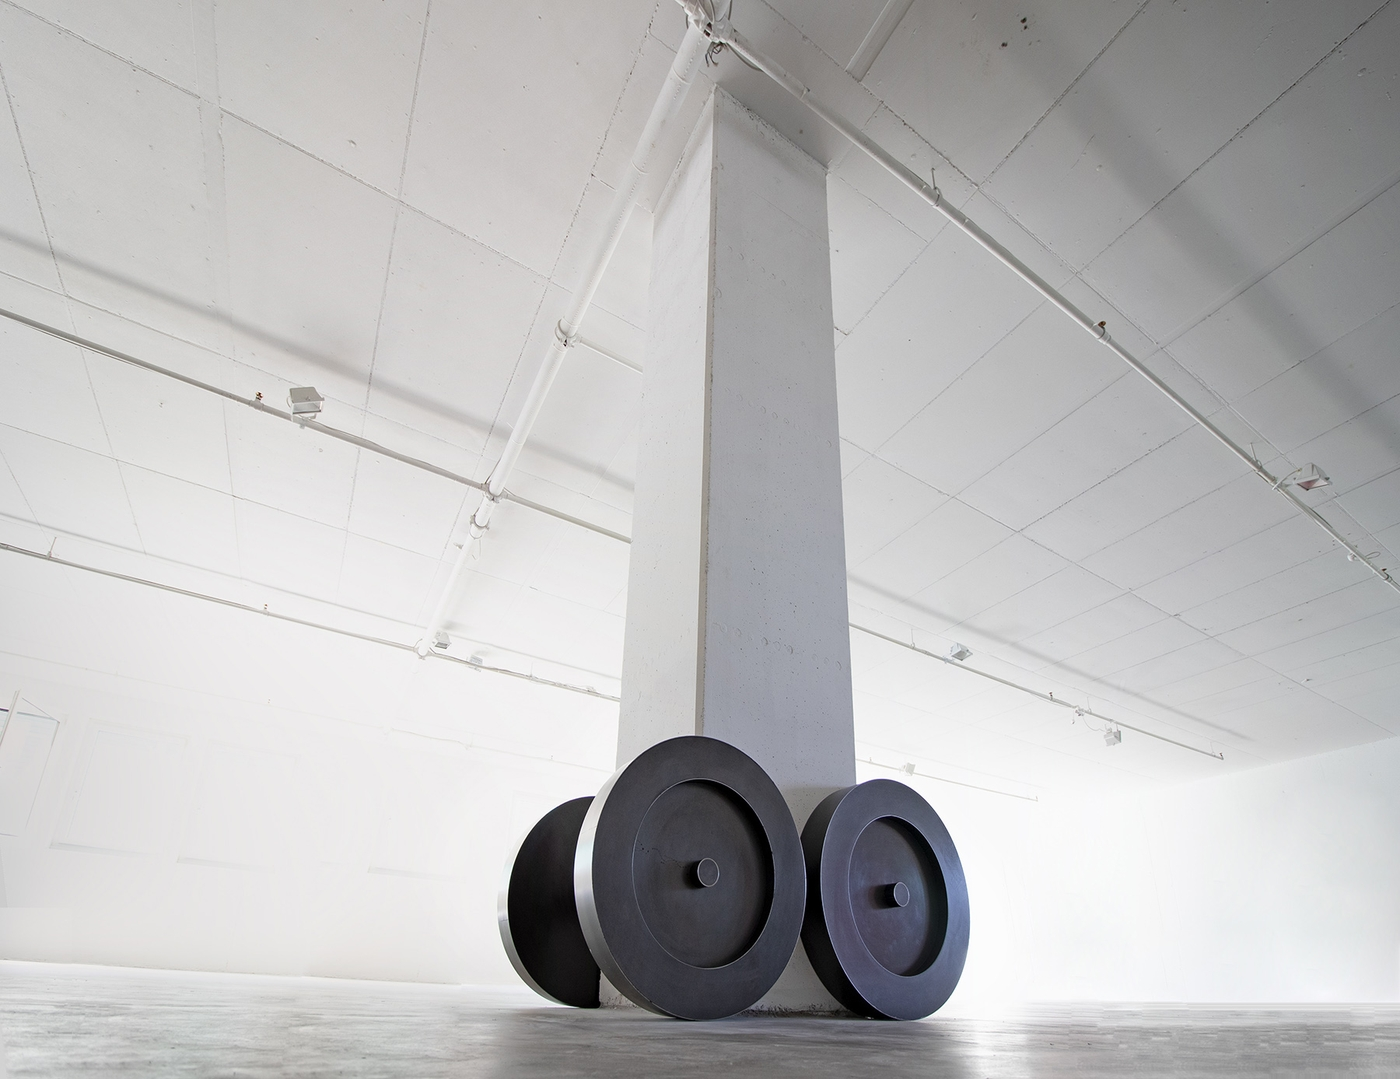 A sostegno dell'Arte, Kunsthalle West, Lana, BZ, Photo ©  Ulrich Egger